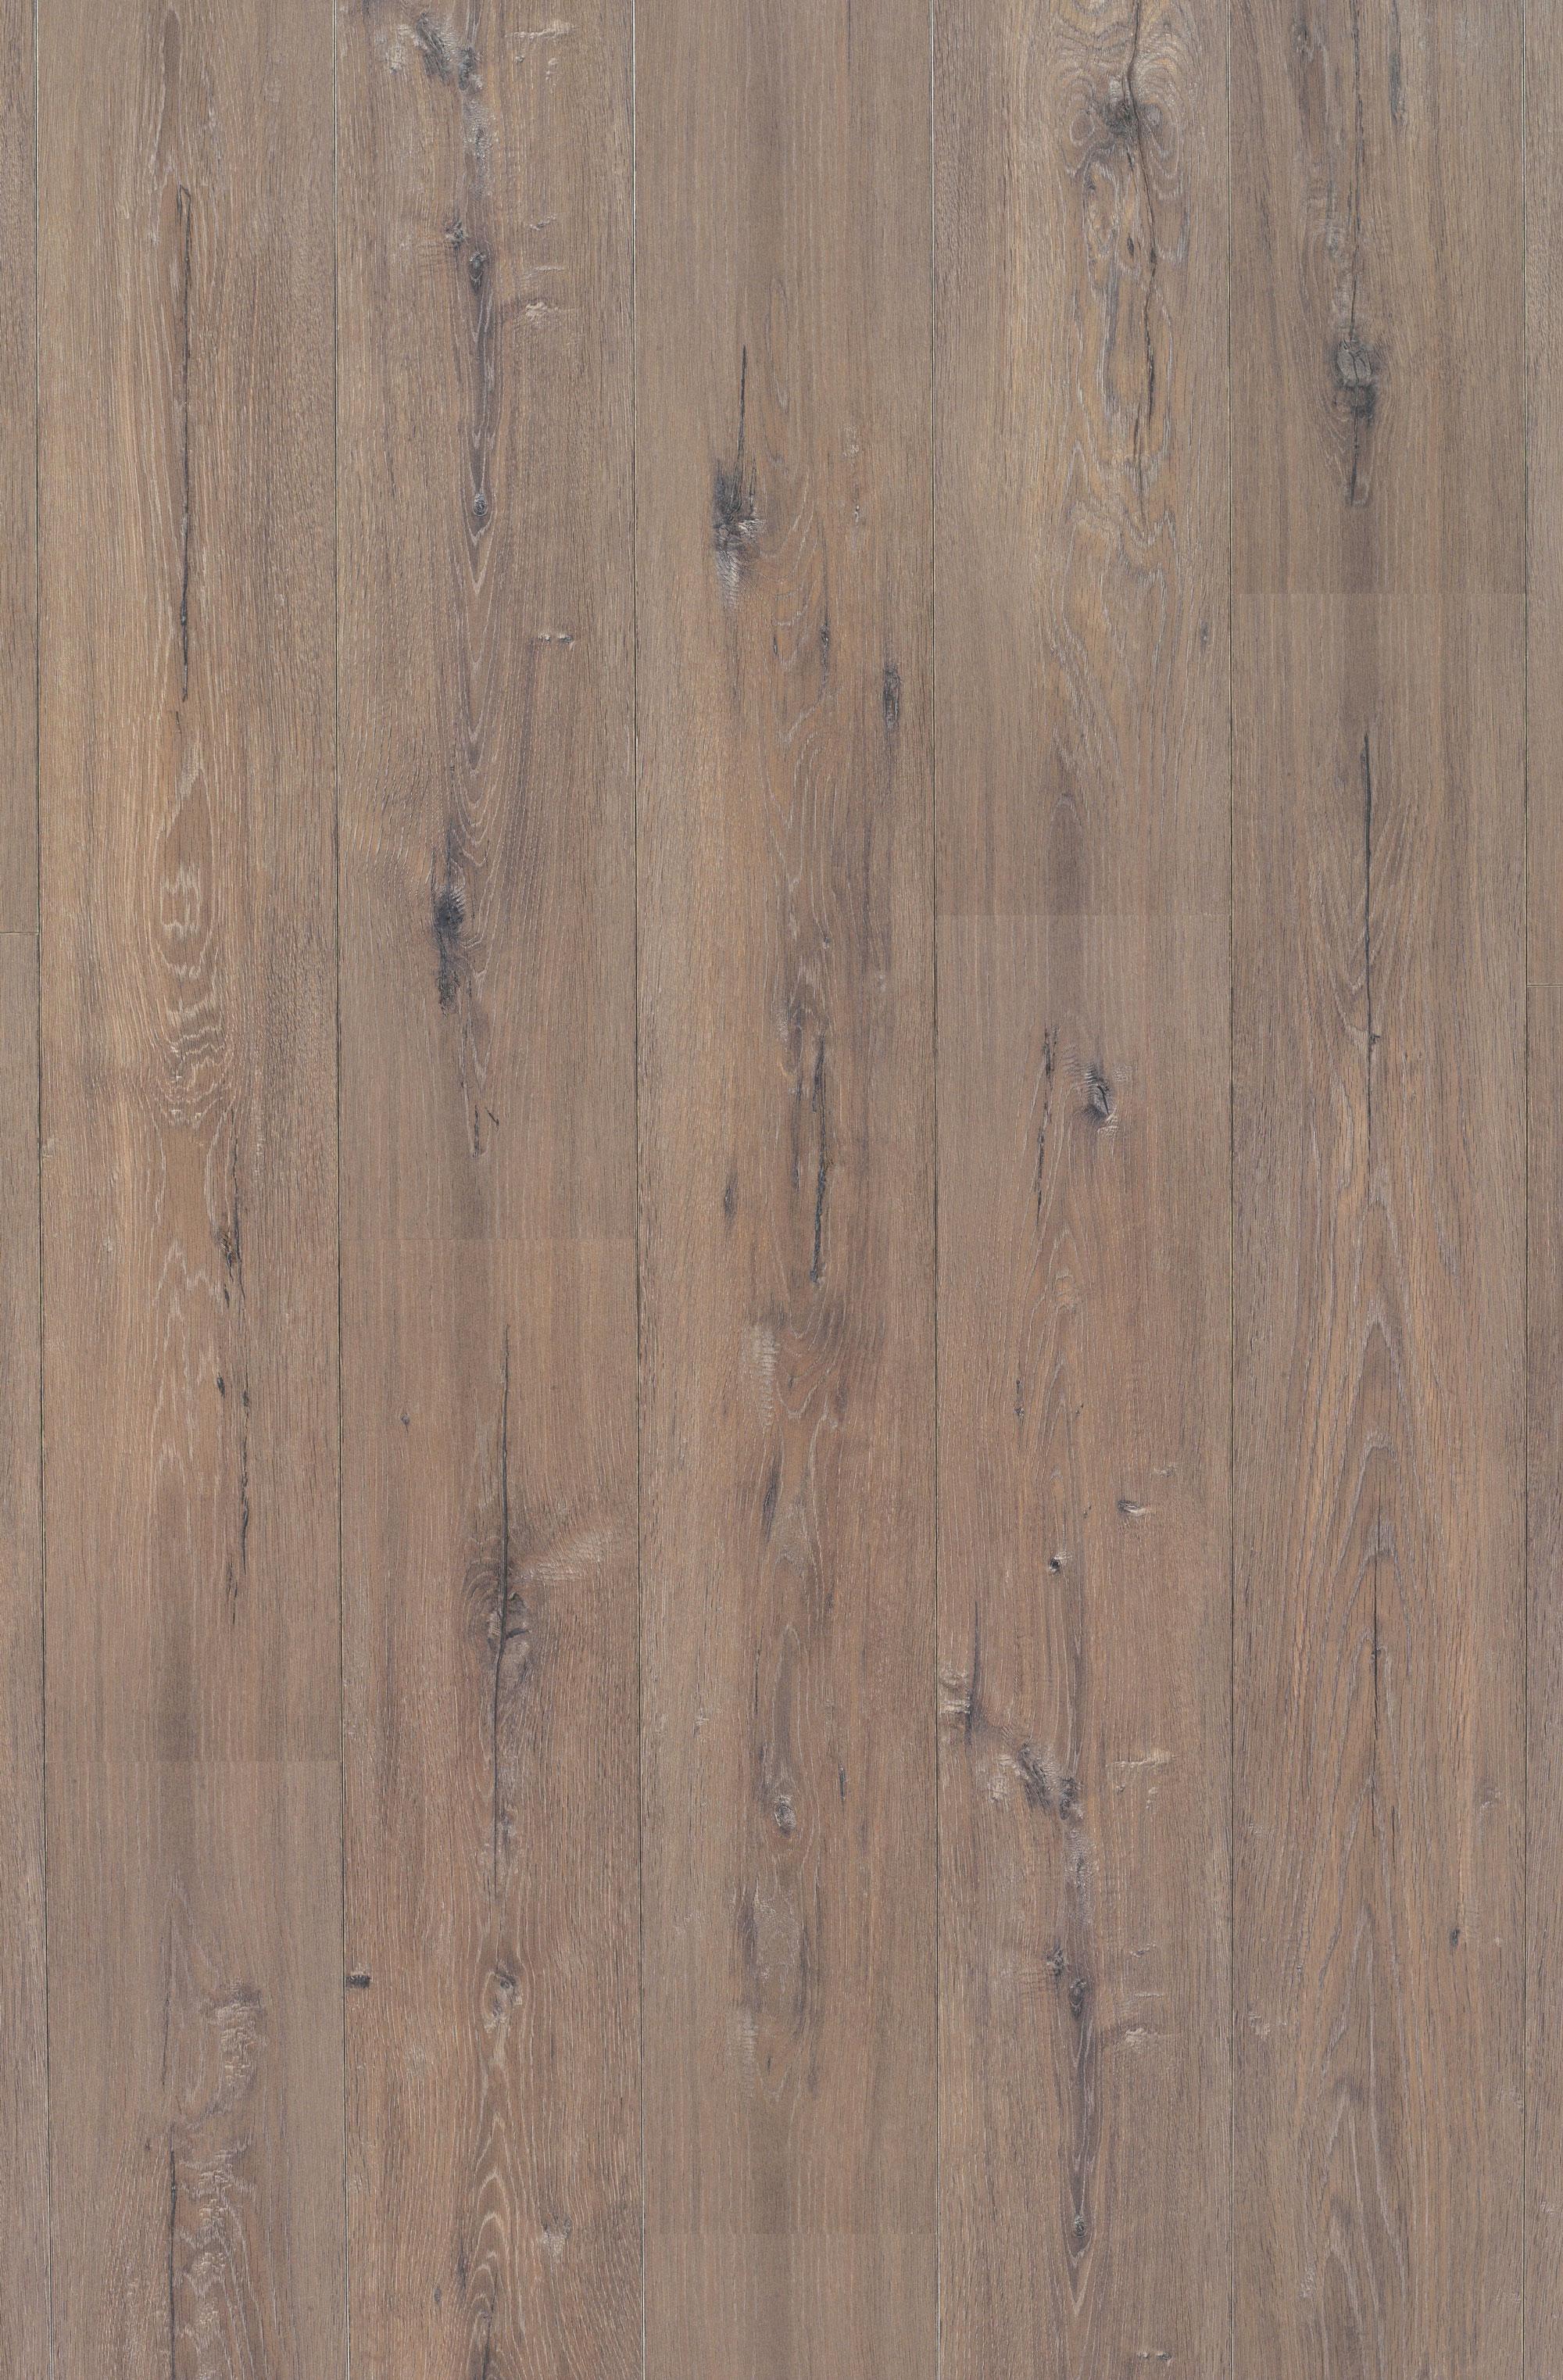 laminat berry alloc loft eiche millenium natur woodi24. Black Bedroom Furniture Sets. Home Design Ideas